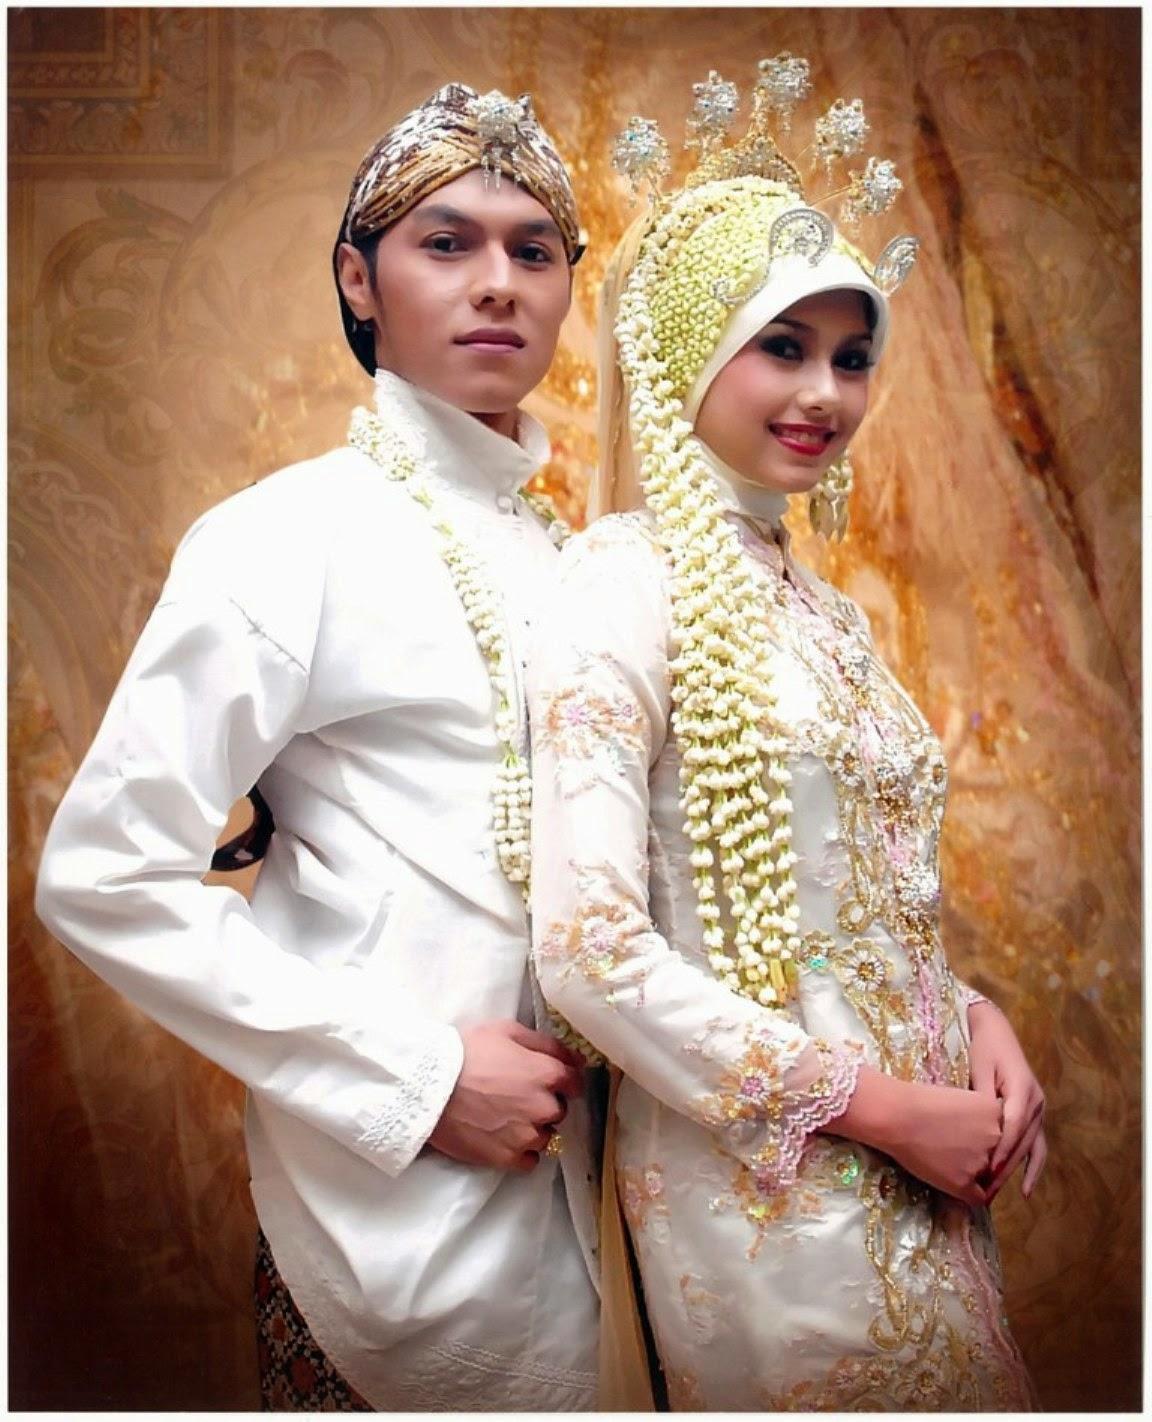 Kumpulan Contoh Foto Pre Wedding 2019 Indonesian Photography